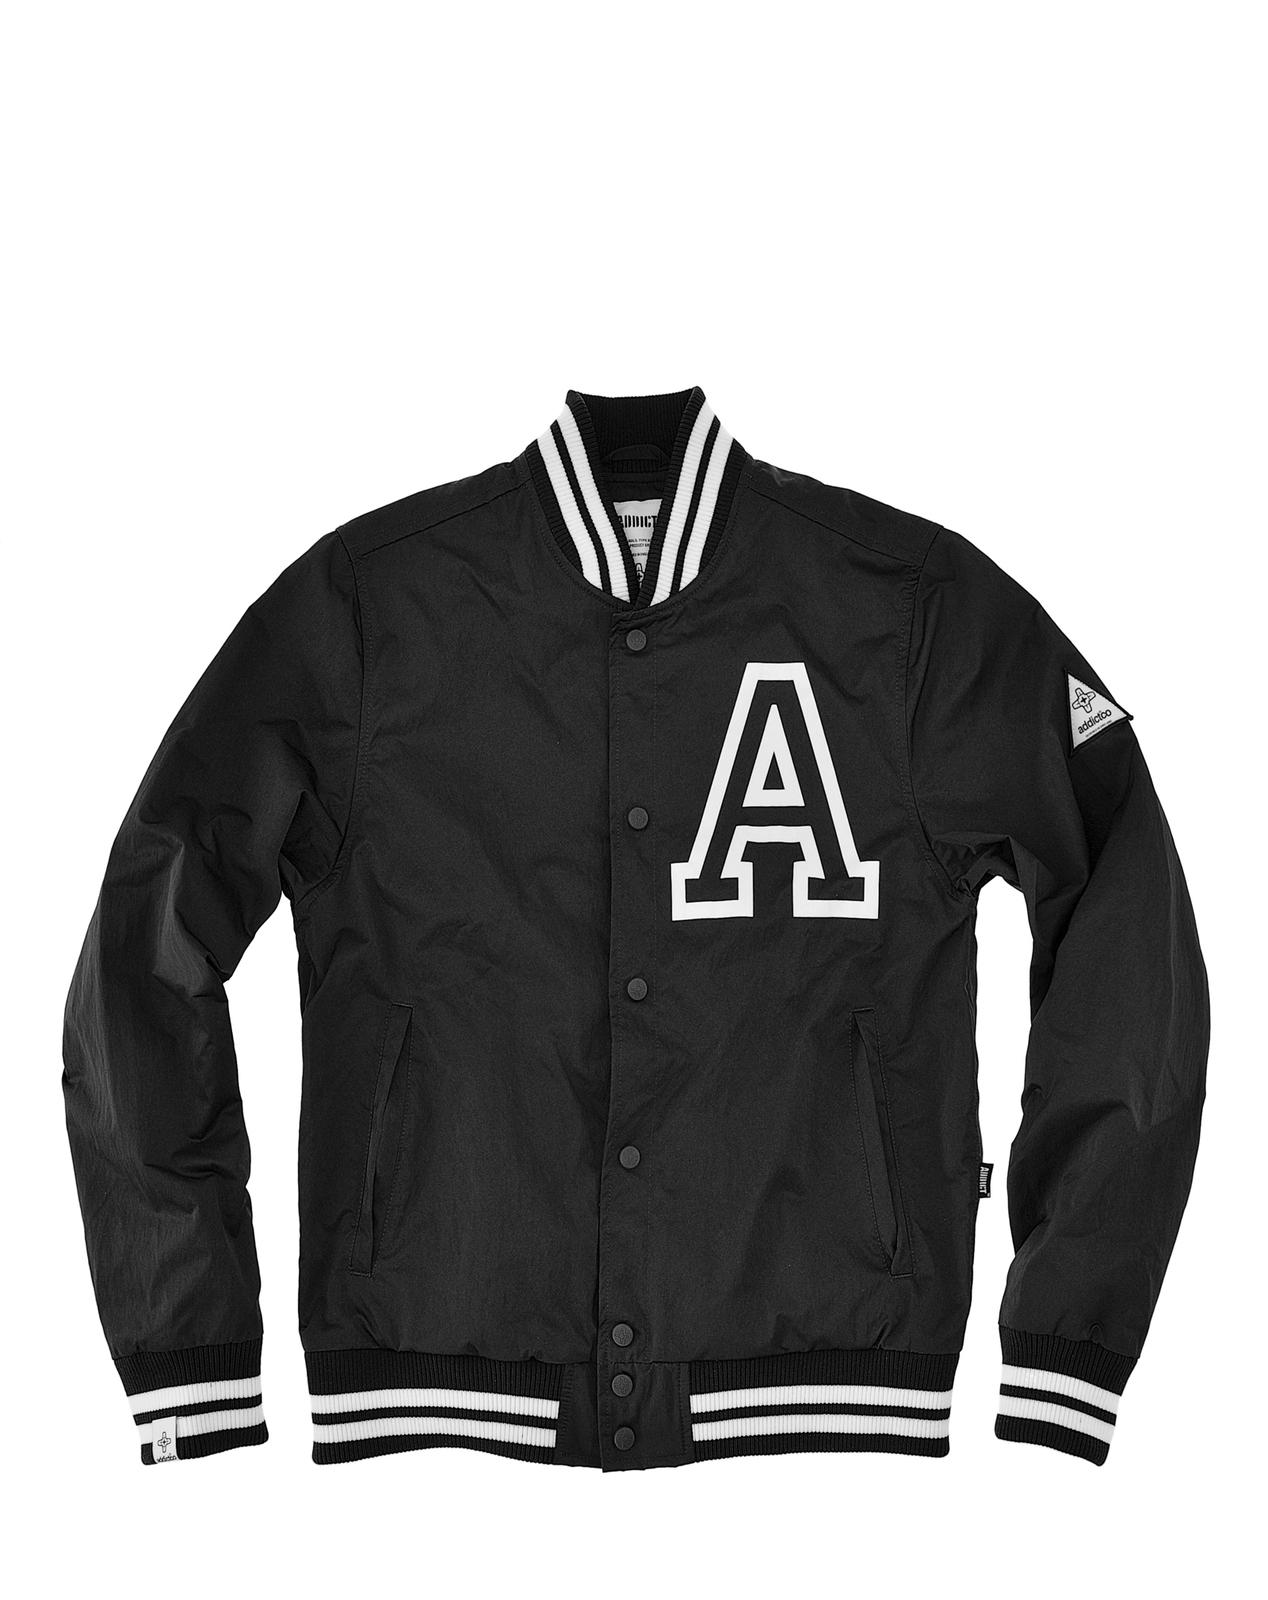 Addict Mens College Style Bomber Varsity Tour Jacket | eBay